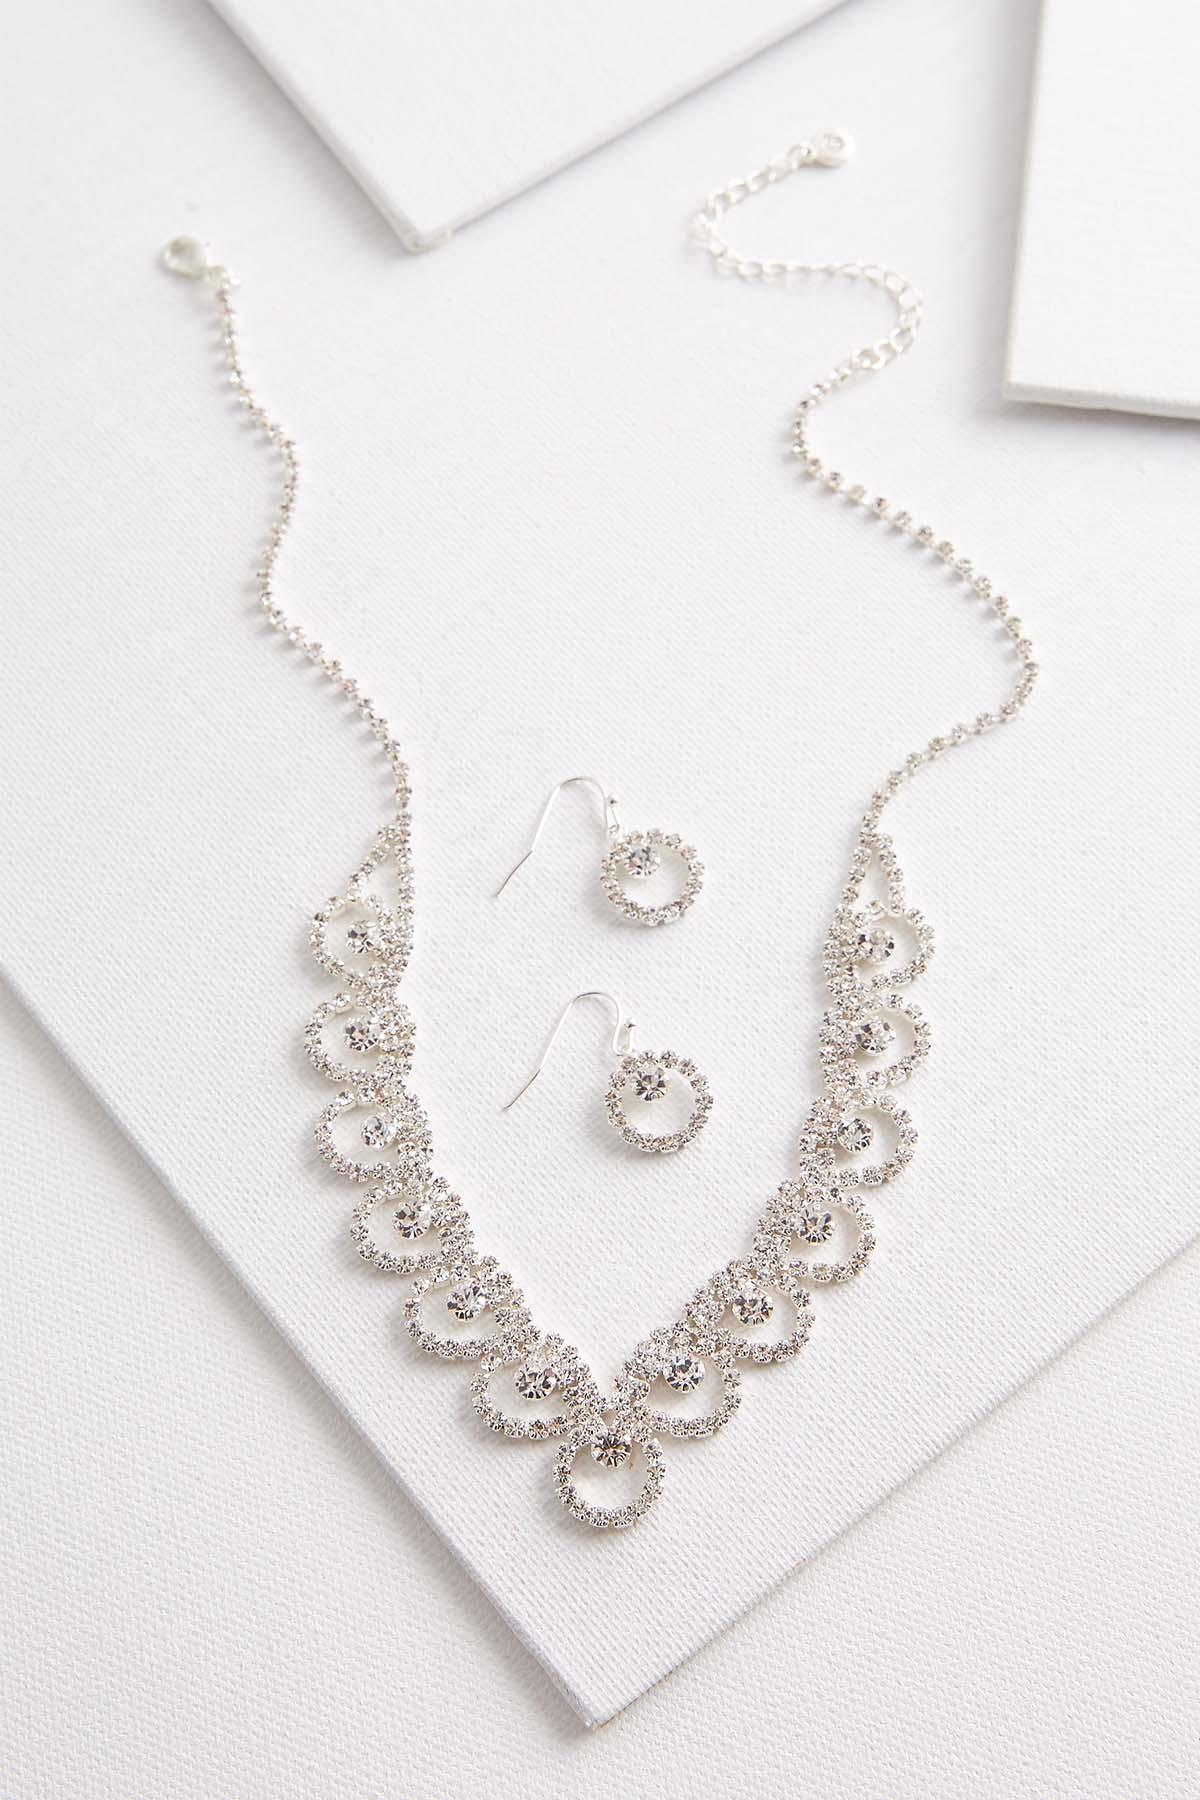 Glam Rhinestone Necklace And Earring Set